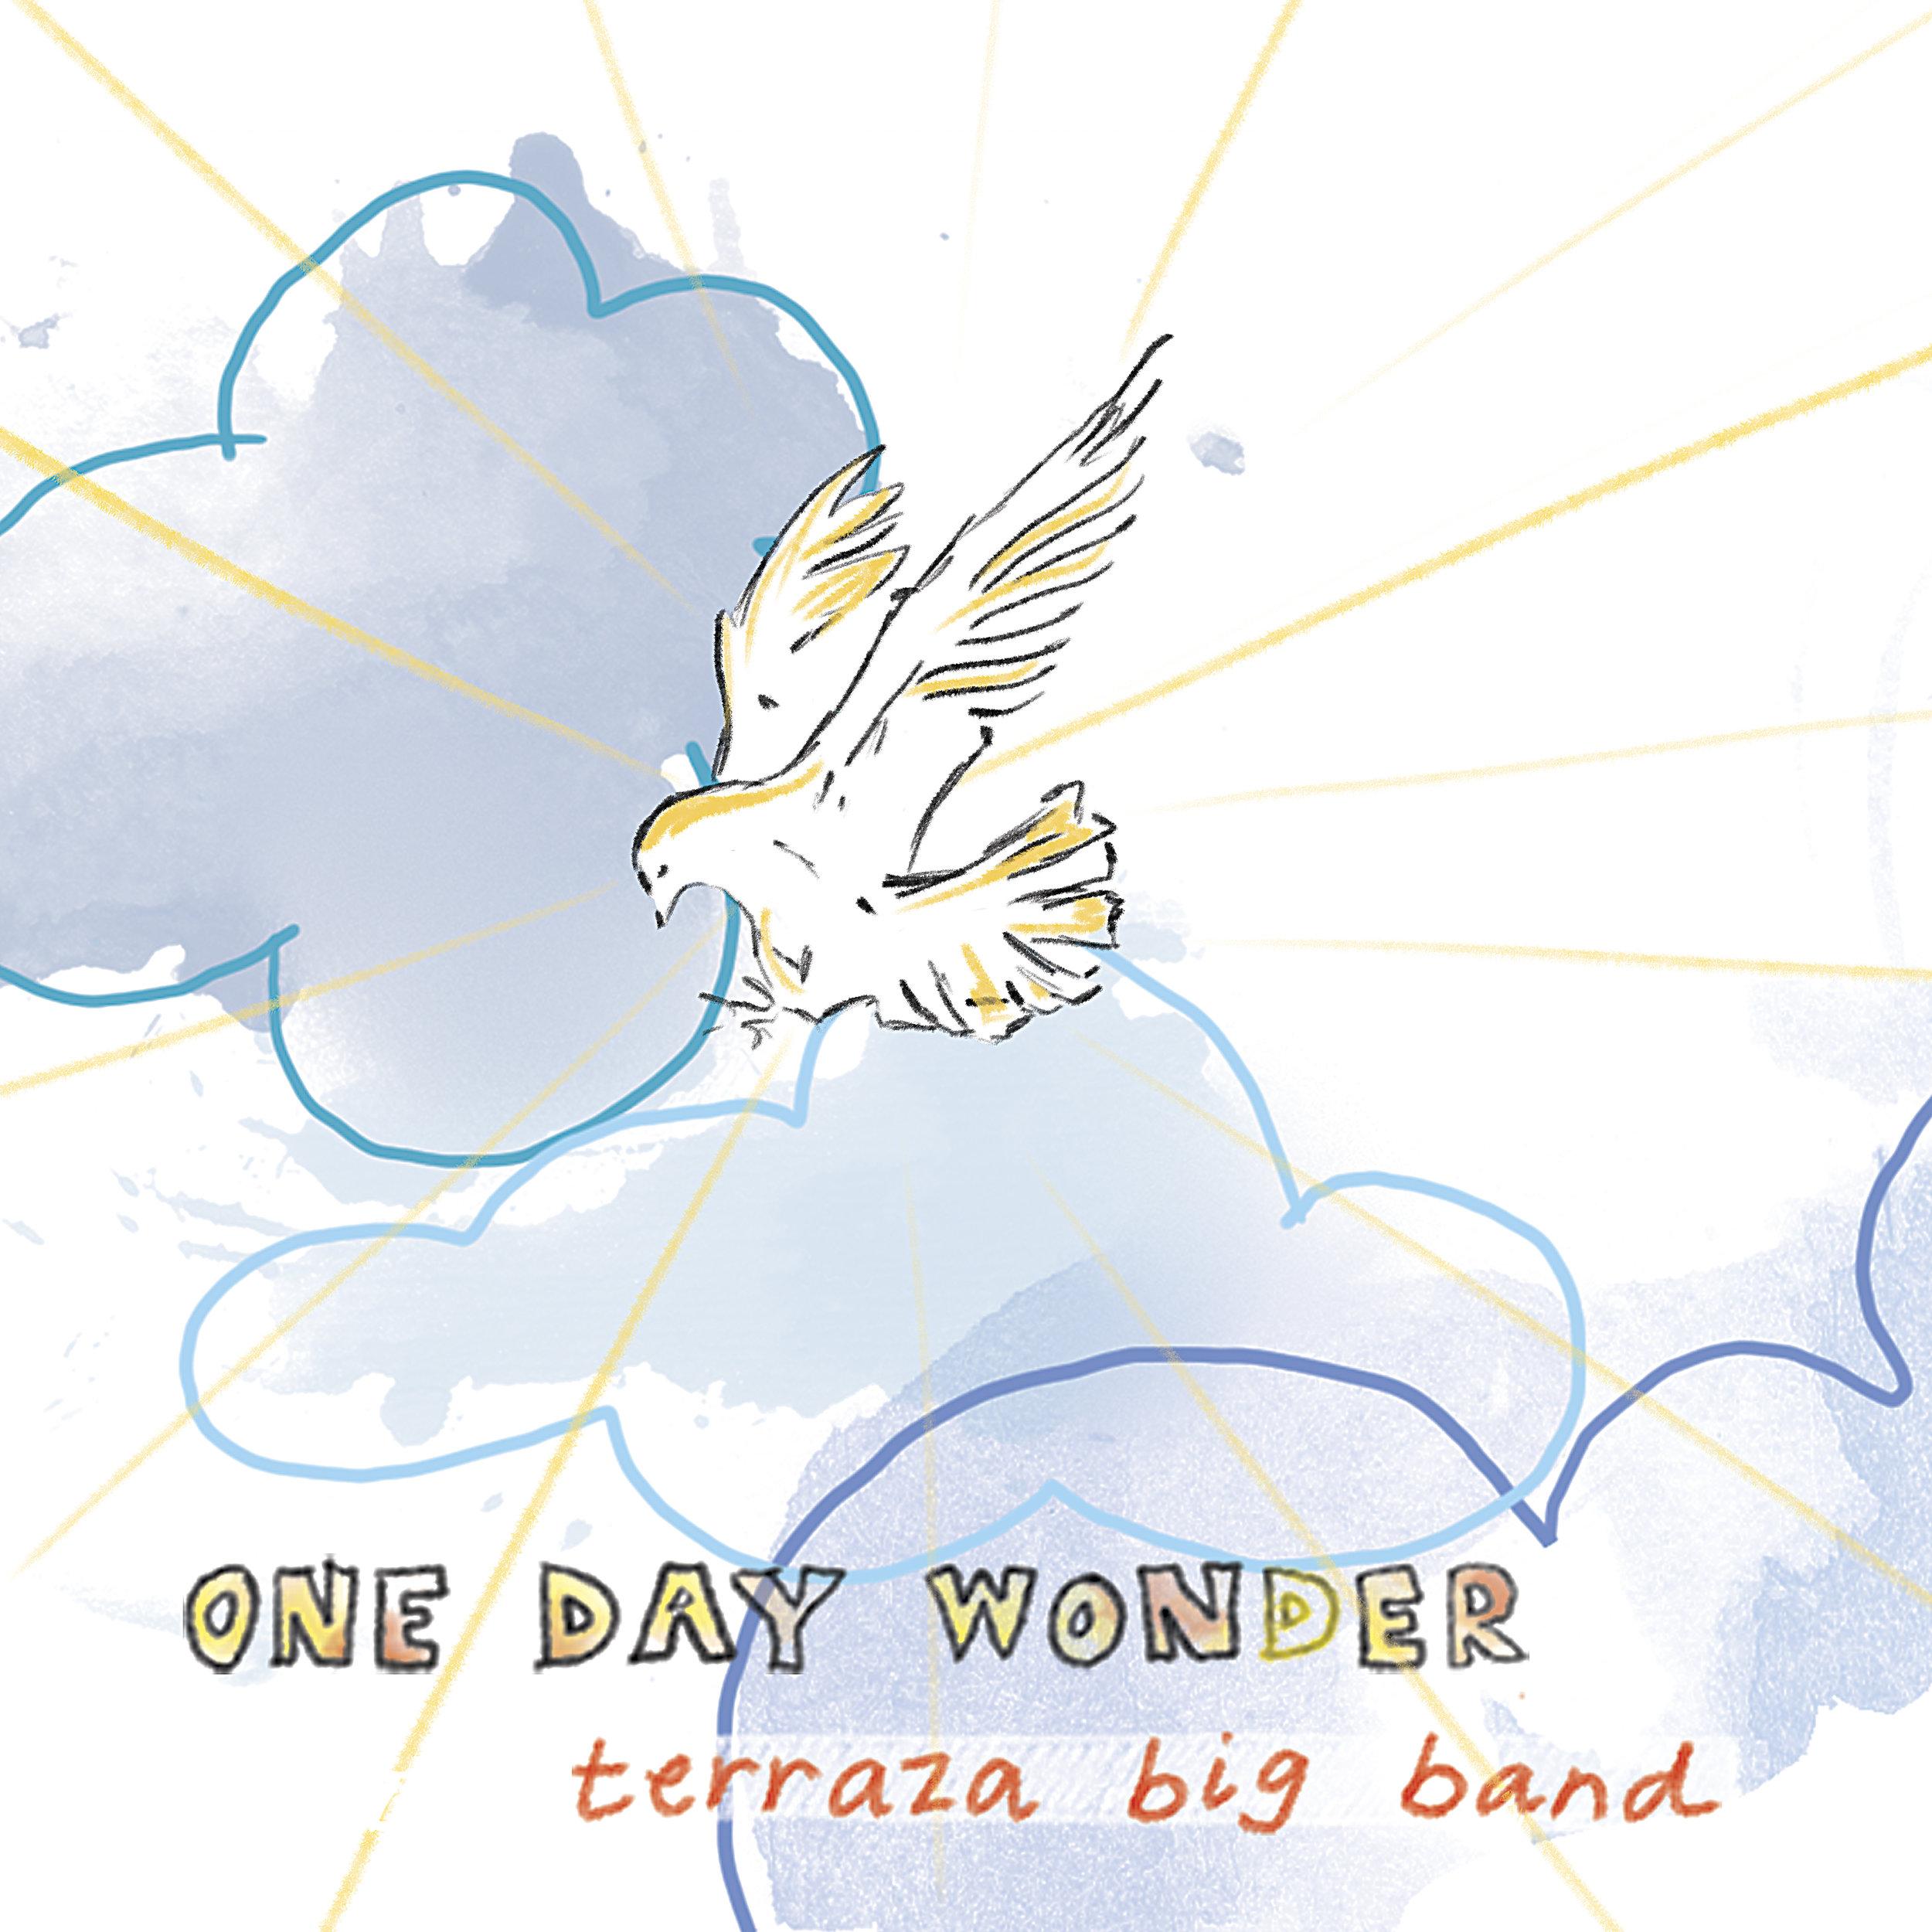 TBB single _One Day Wonder_ 3000x.jpg